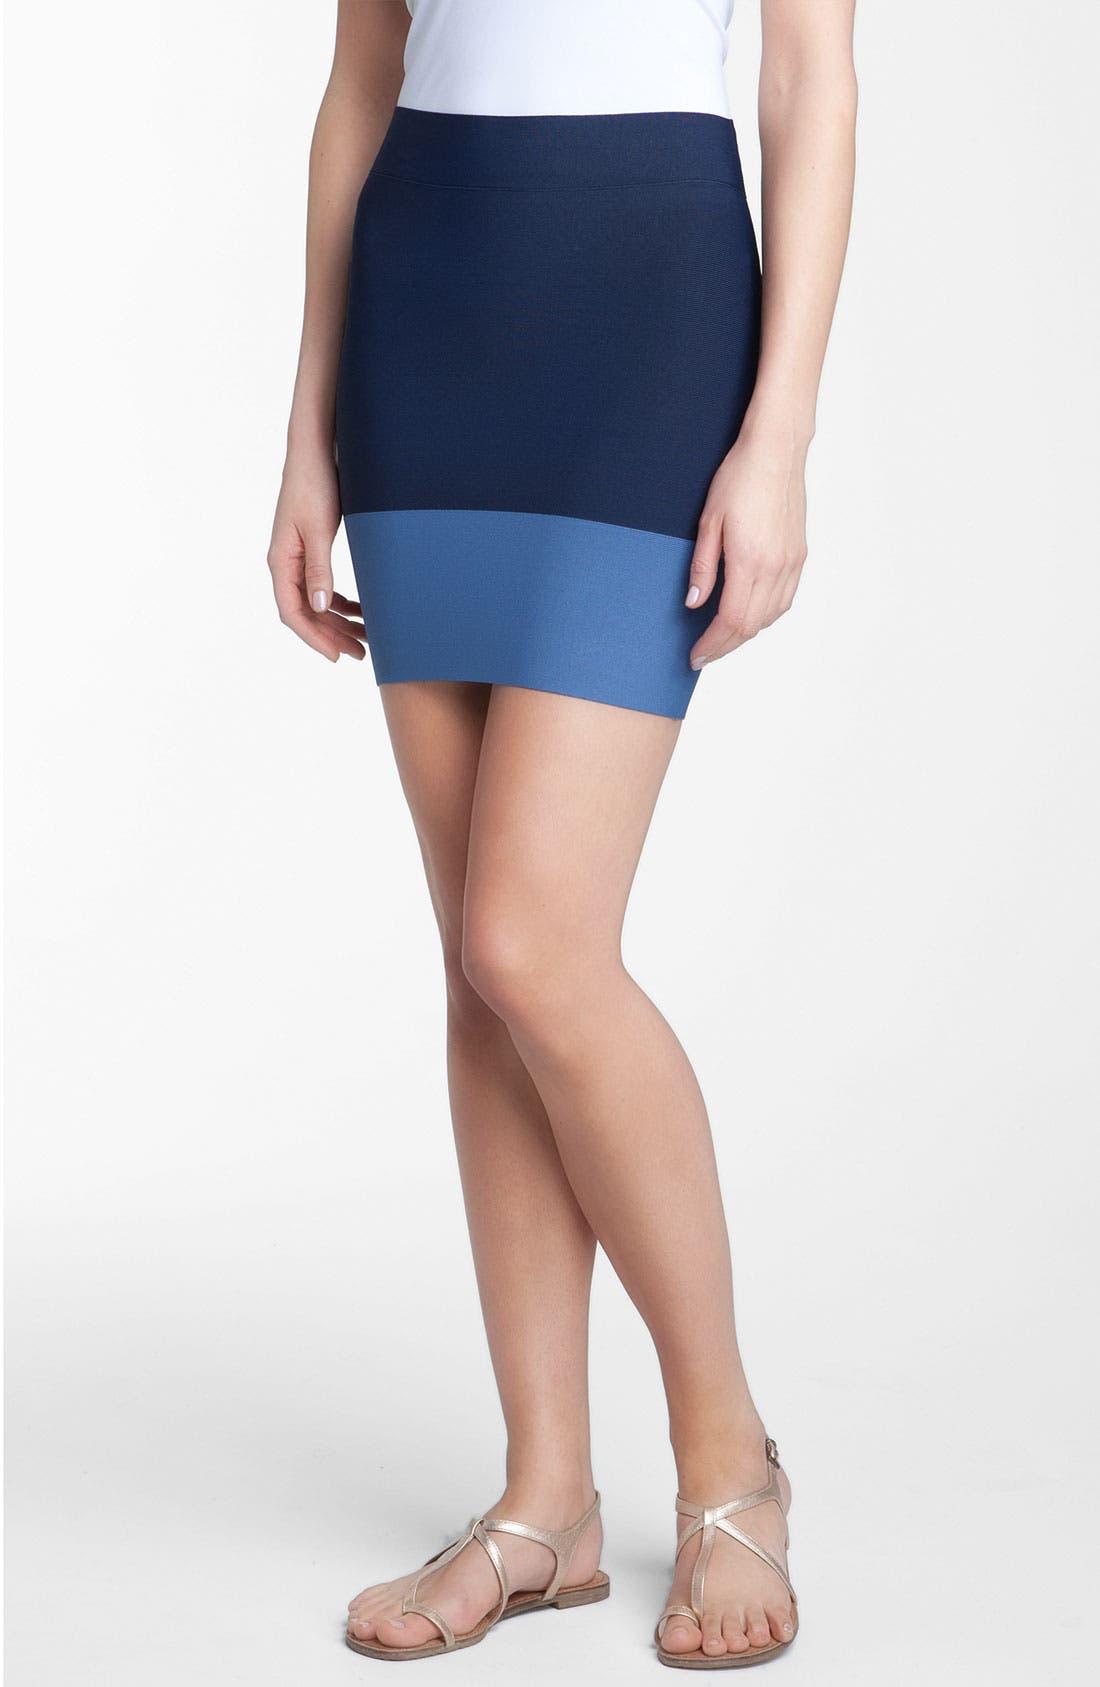 Alternate Image 1 Selected - BCBGMAXAZRIA Colorblock Bandage Skirt